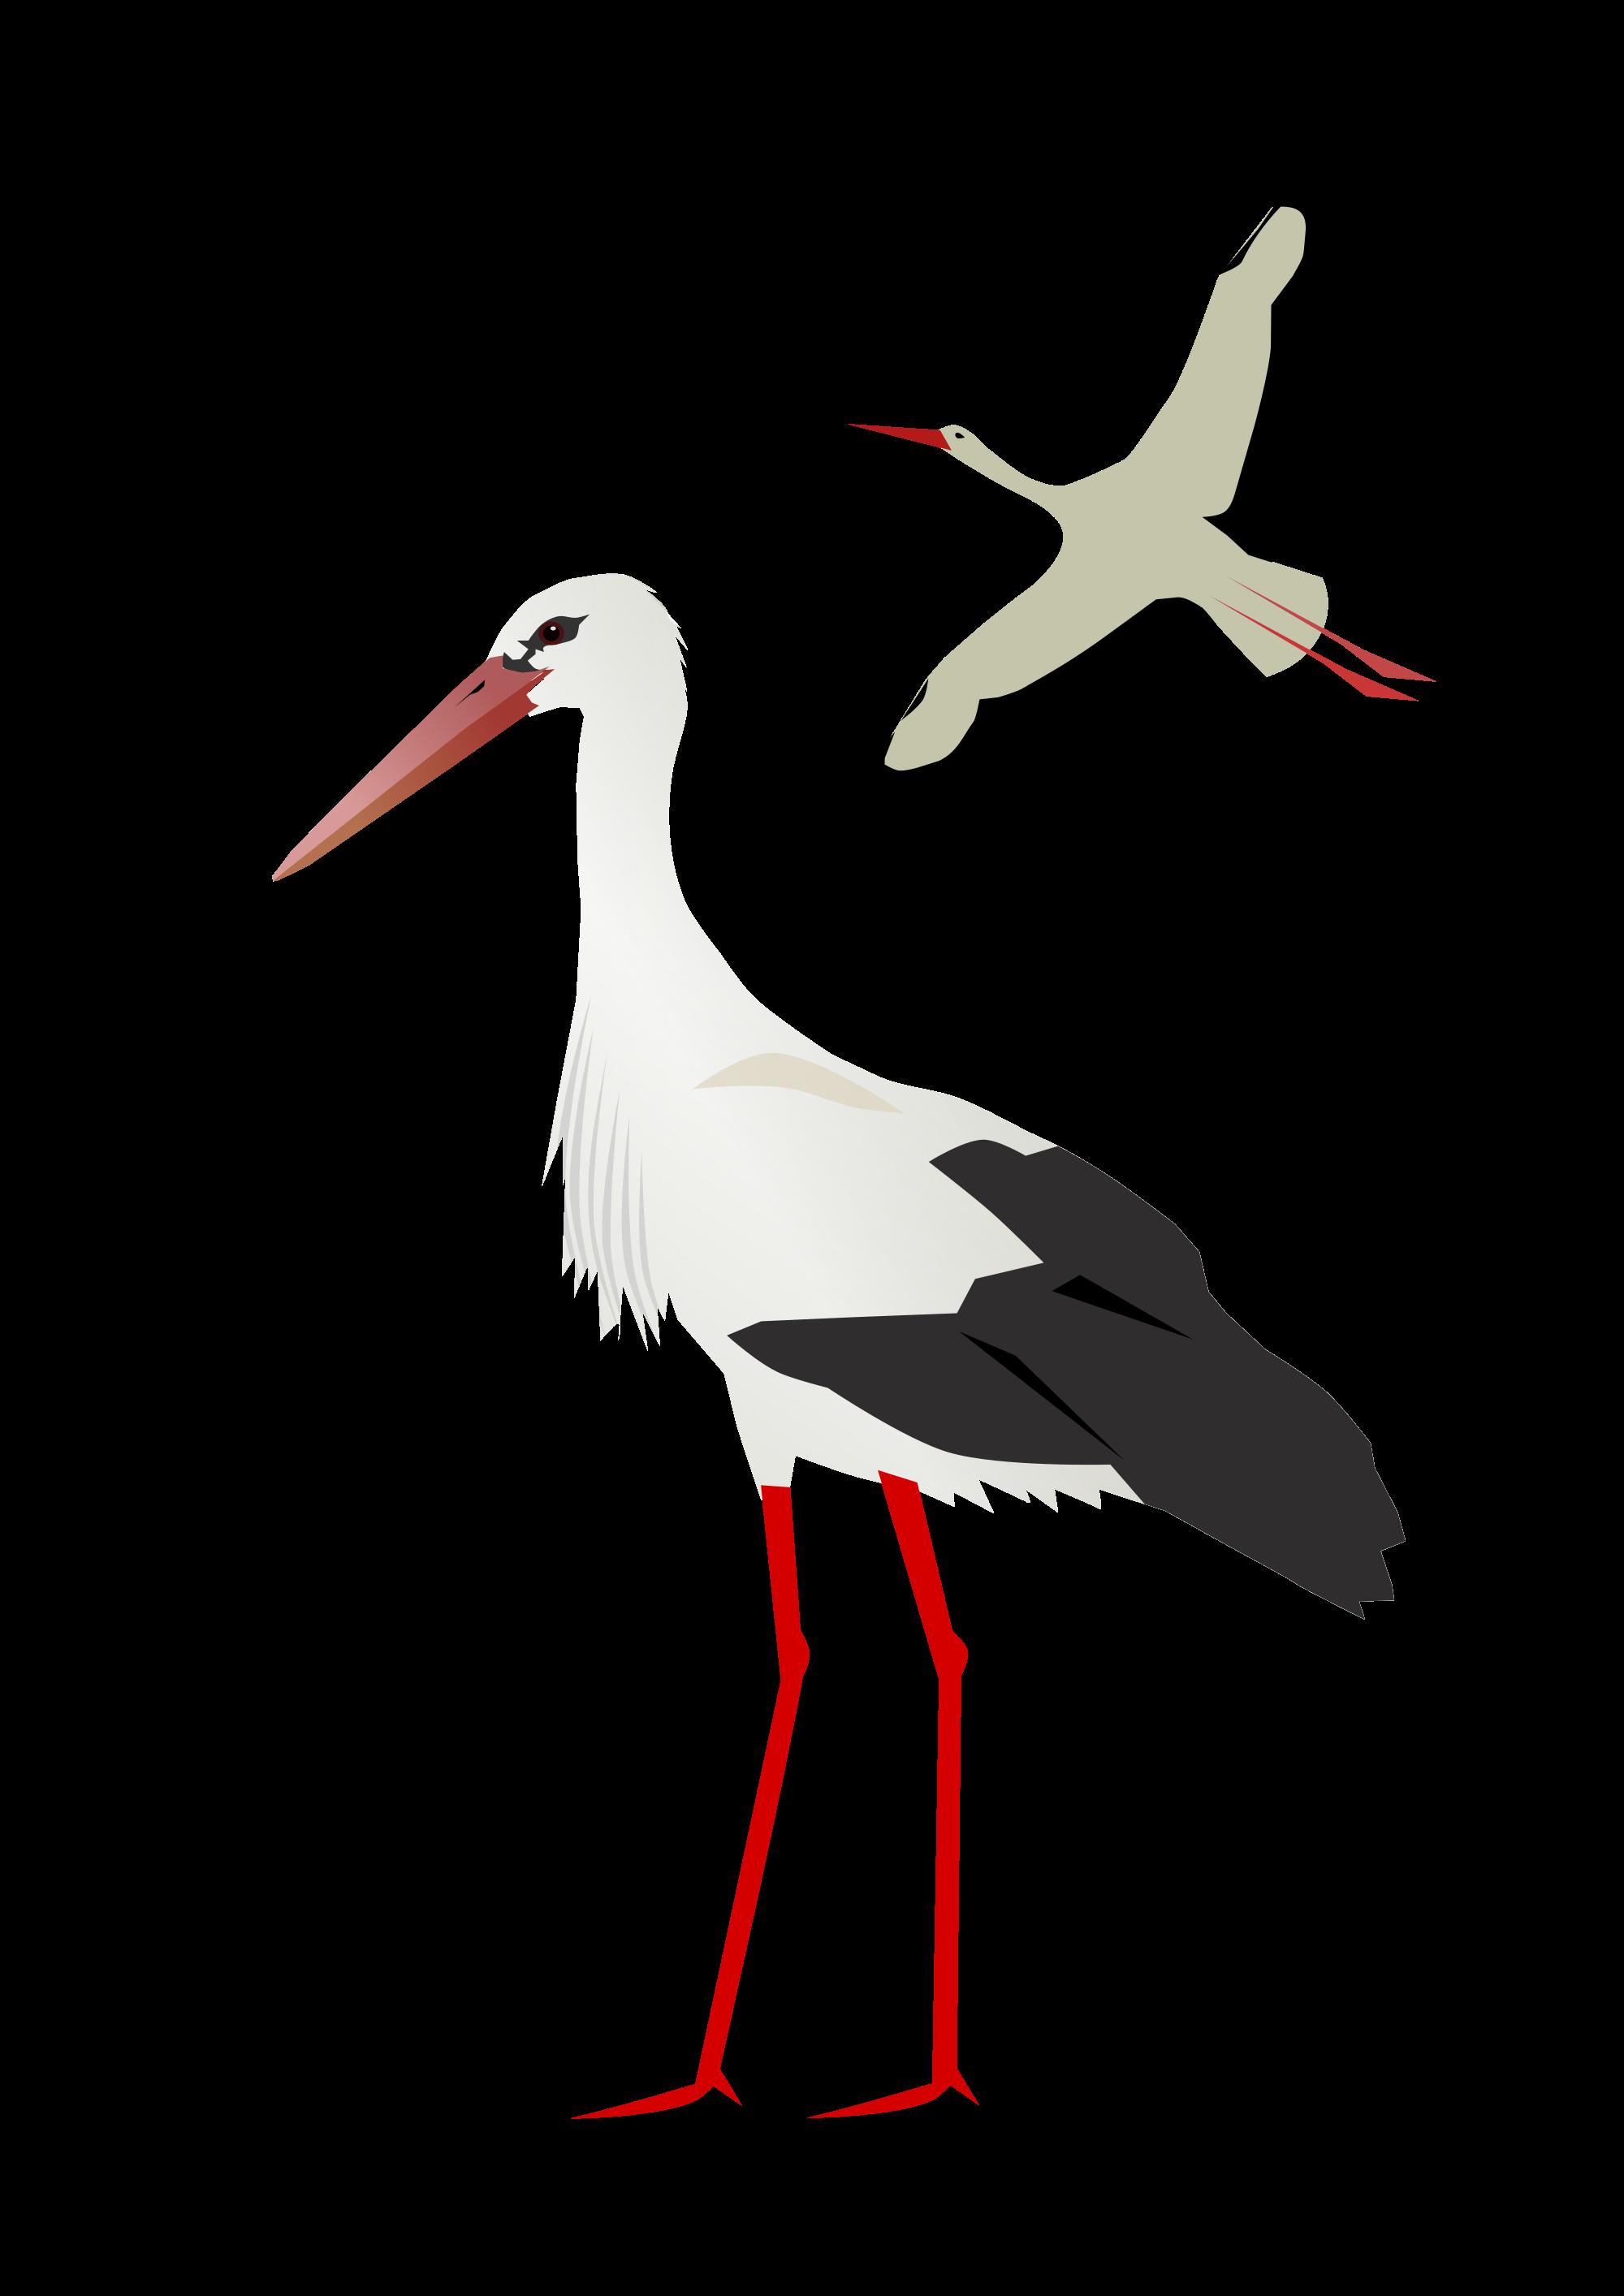 Stork PNG images free download.